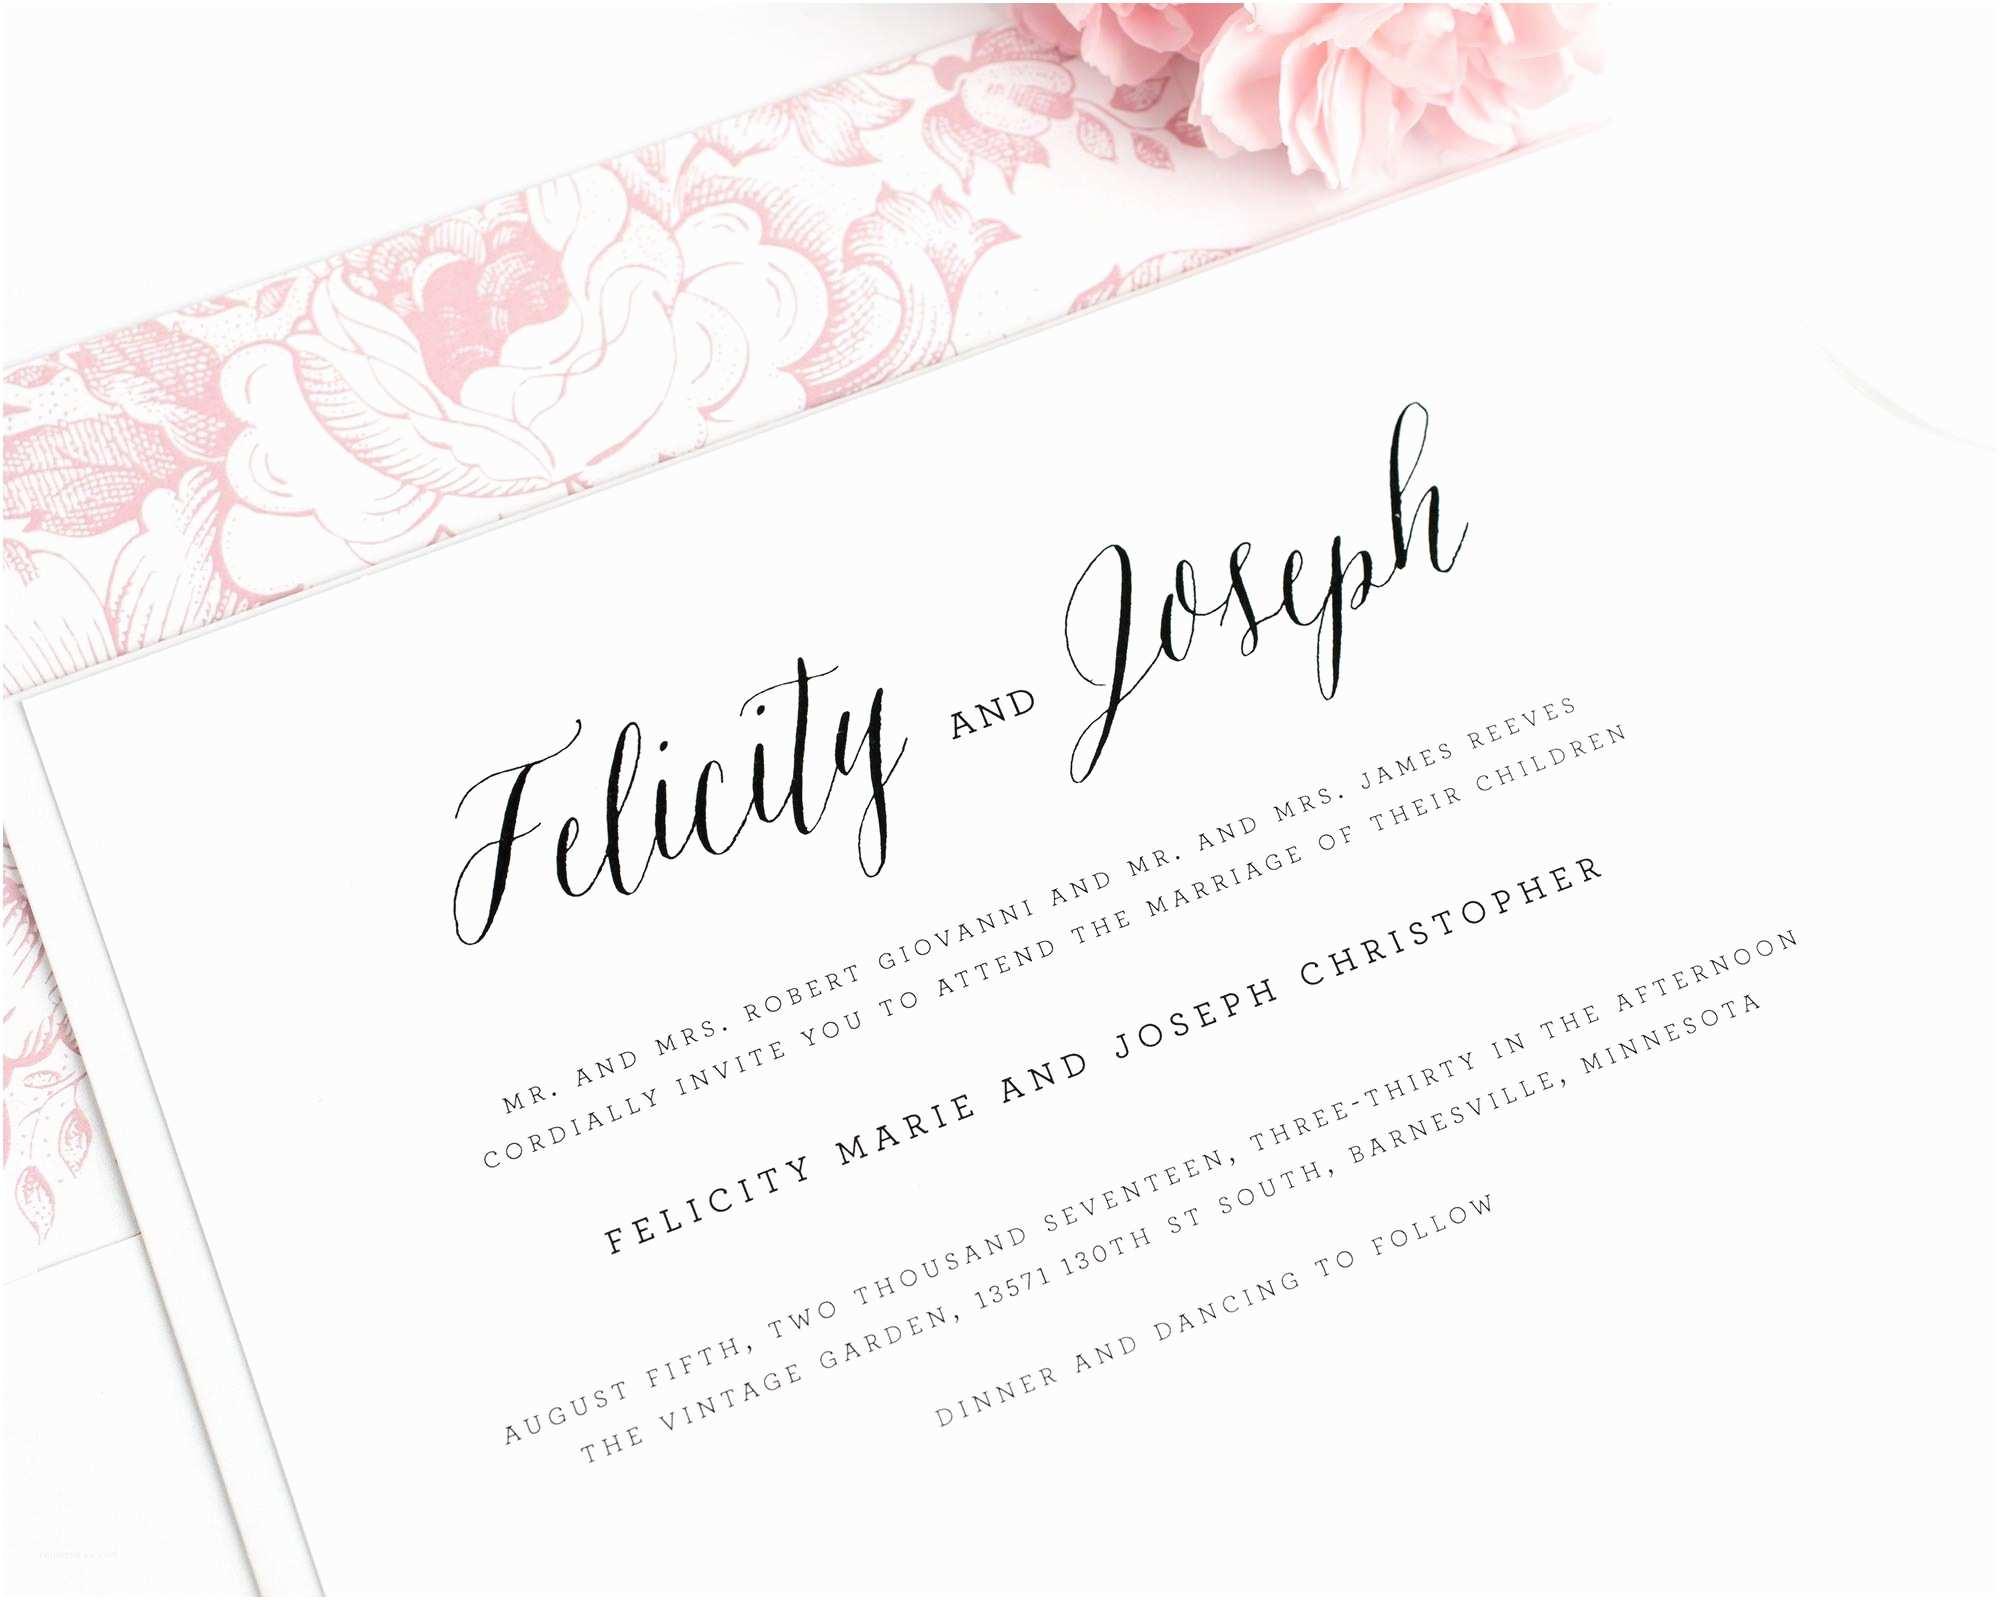 Wedding Invitations Rochester Ny Wedding Invitations Rochester Ny Fresh Timeless Script